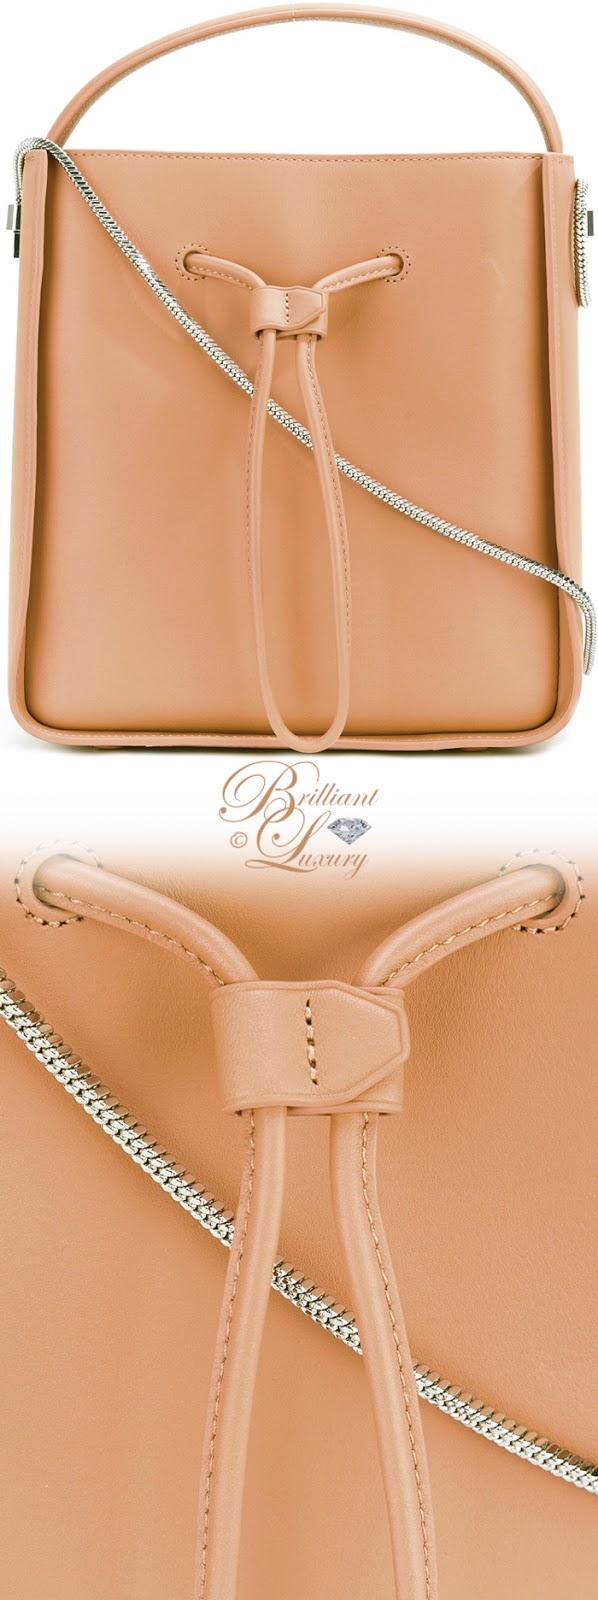 Brilliant Luxury ♦ 3.1 Phillip Lim Small Soleil Bucket Tote